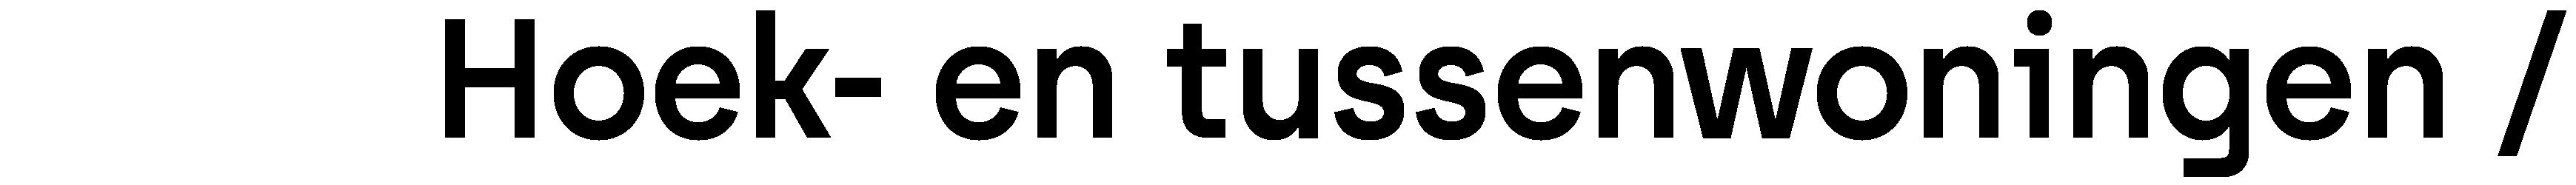 1b739260-1acc-11eb-b536-3d723d45634a.png